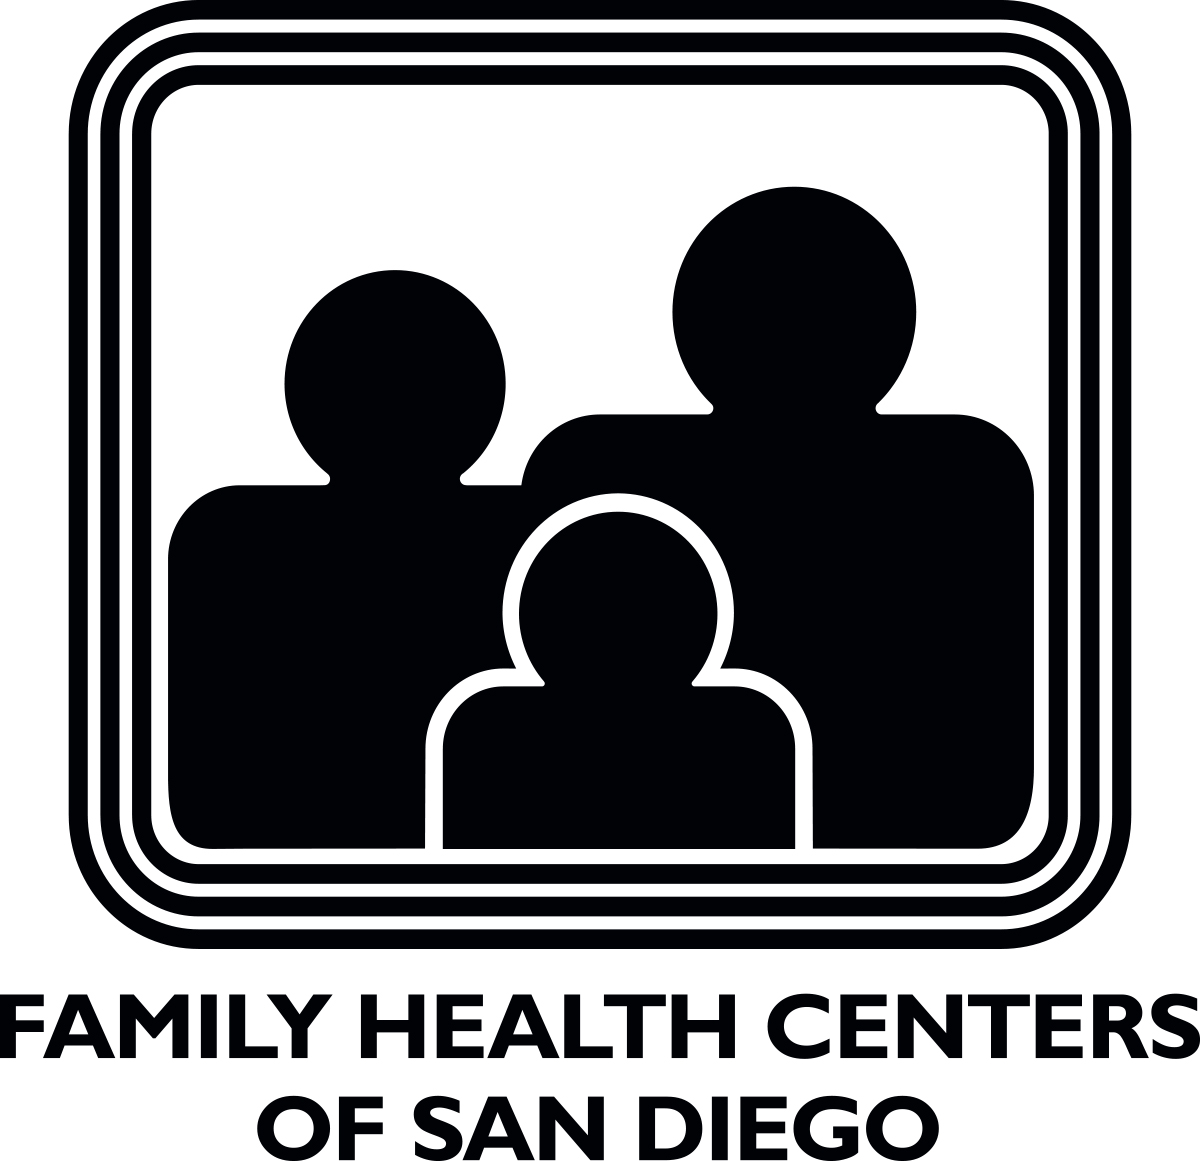 FHCSD_logo_-_0122818.jpg